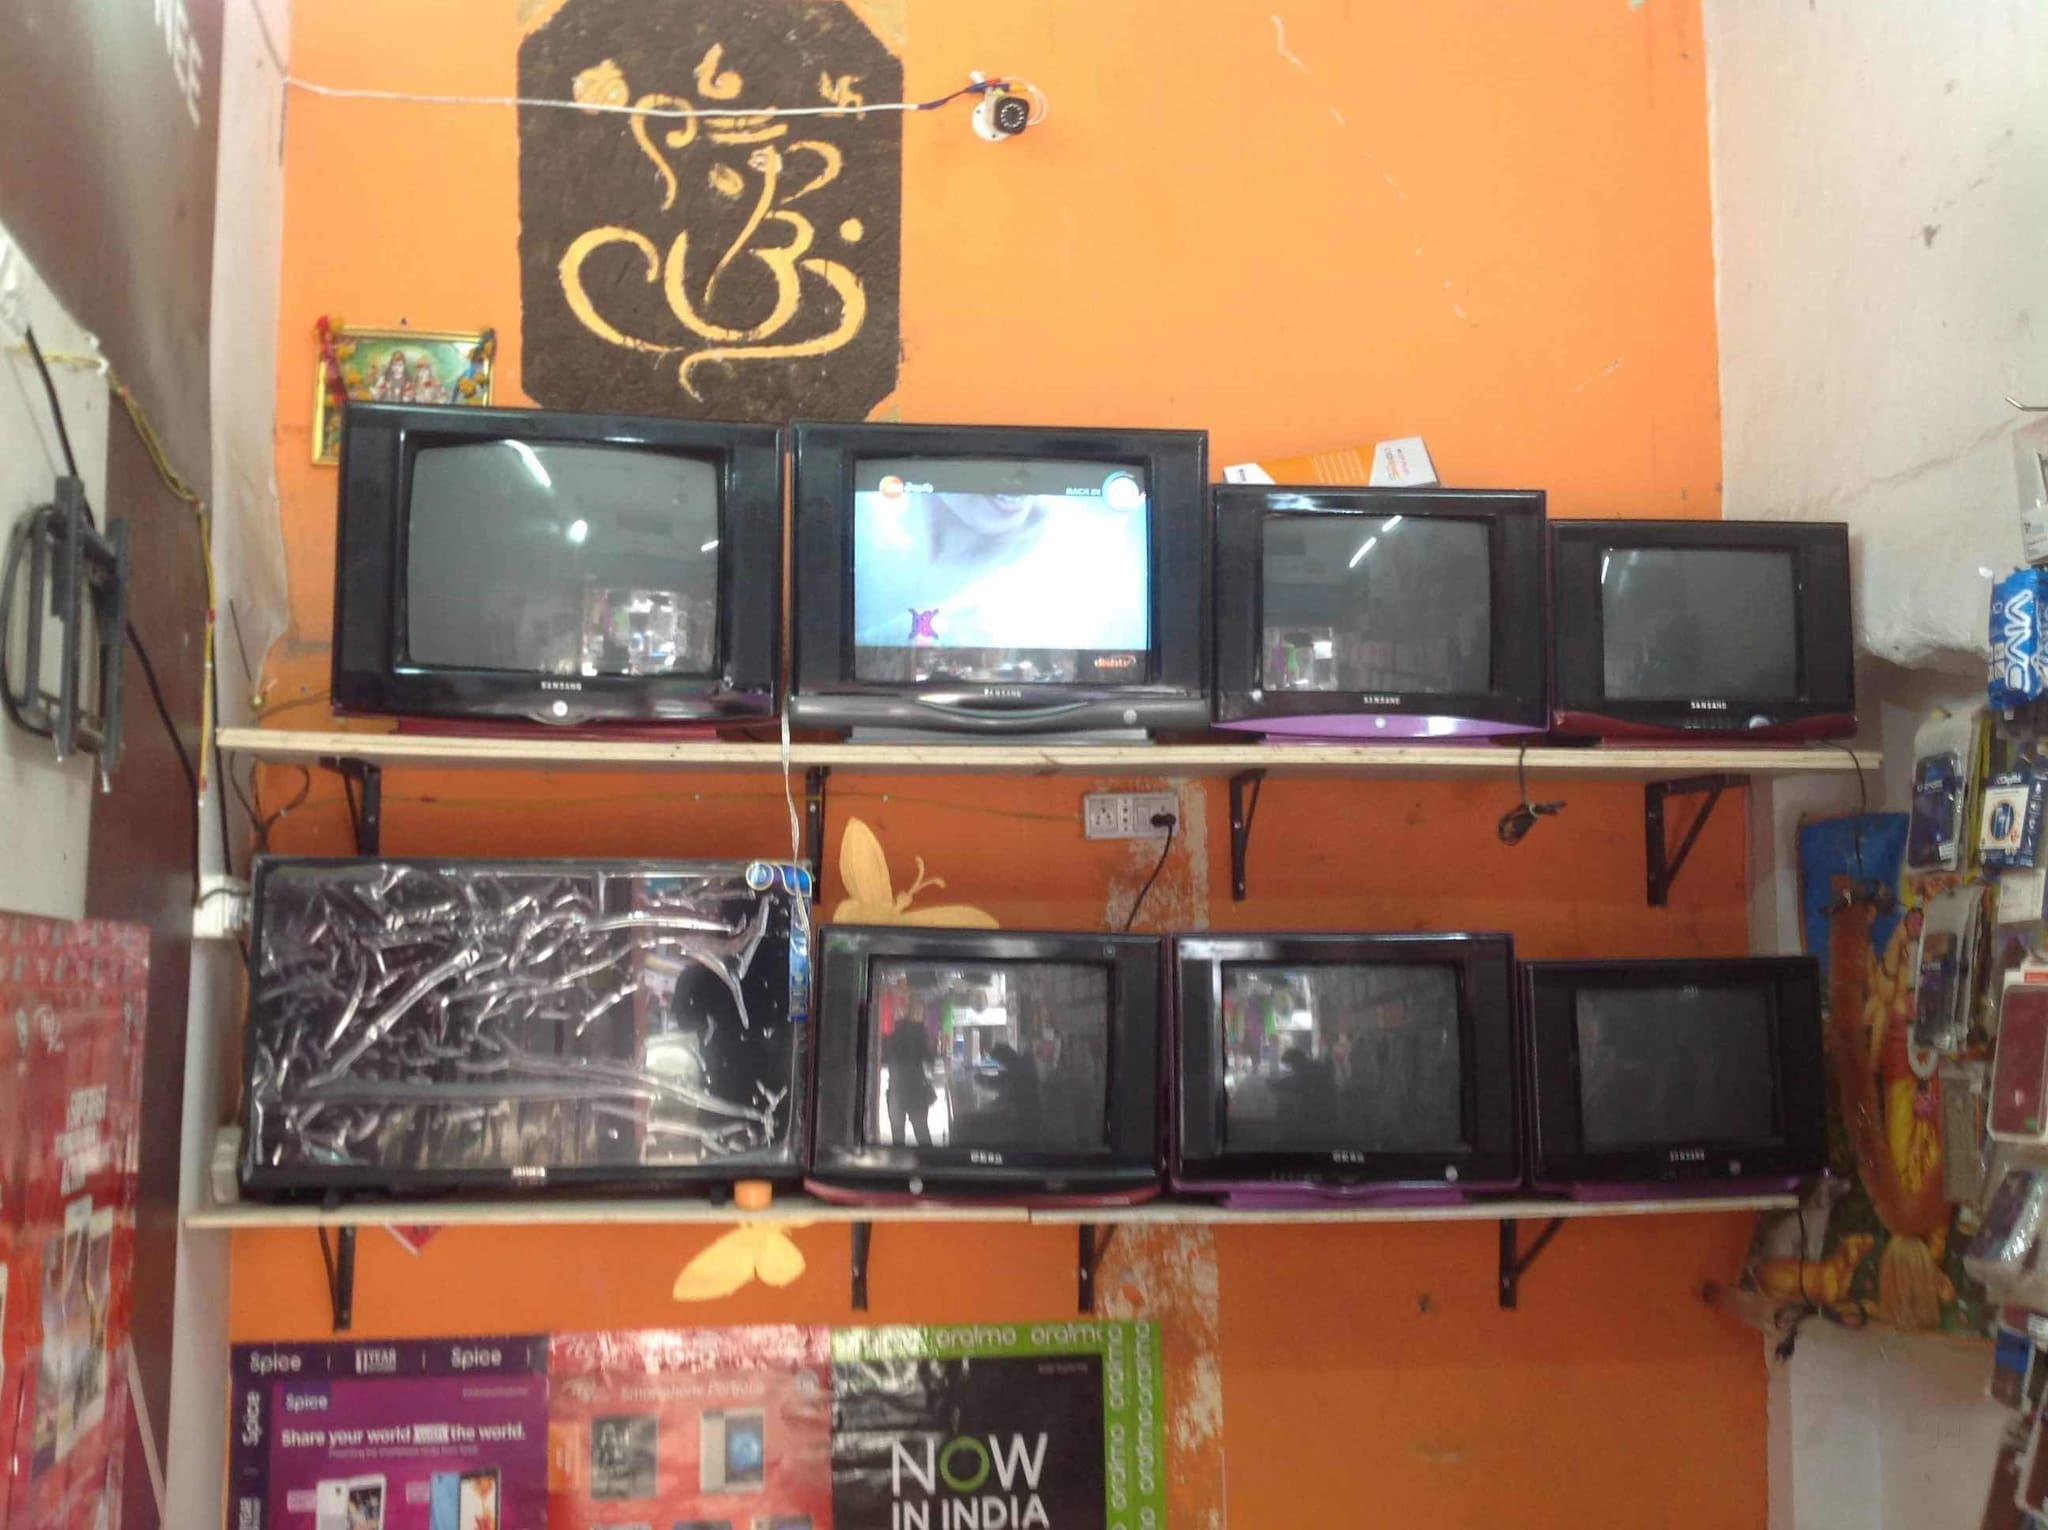 Top Sanyo Tv Dealers in Nizamabad - Best Sanyo Tv Dealers - Justdial